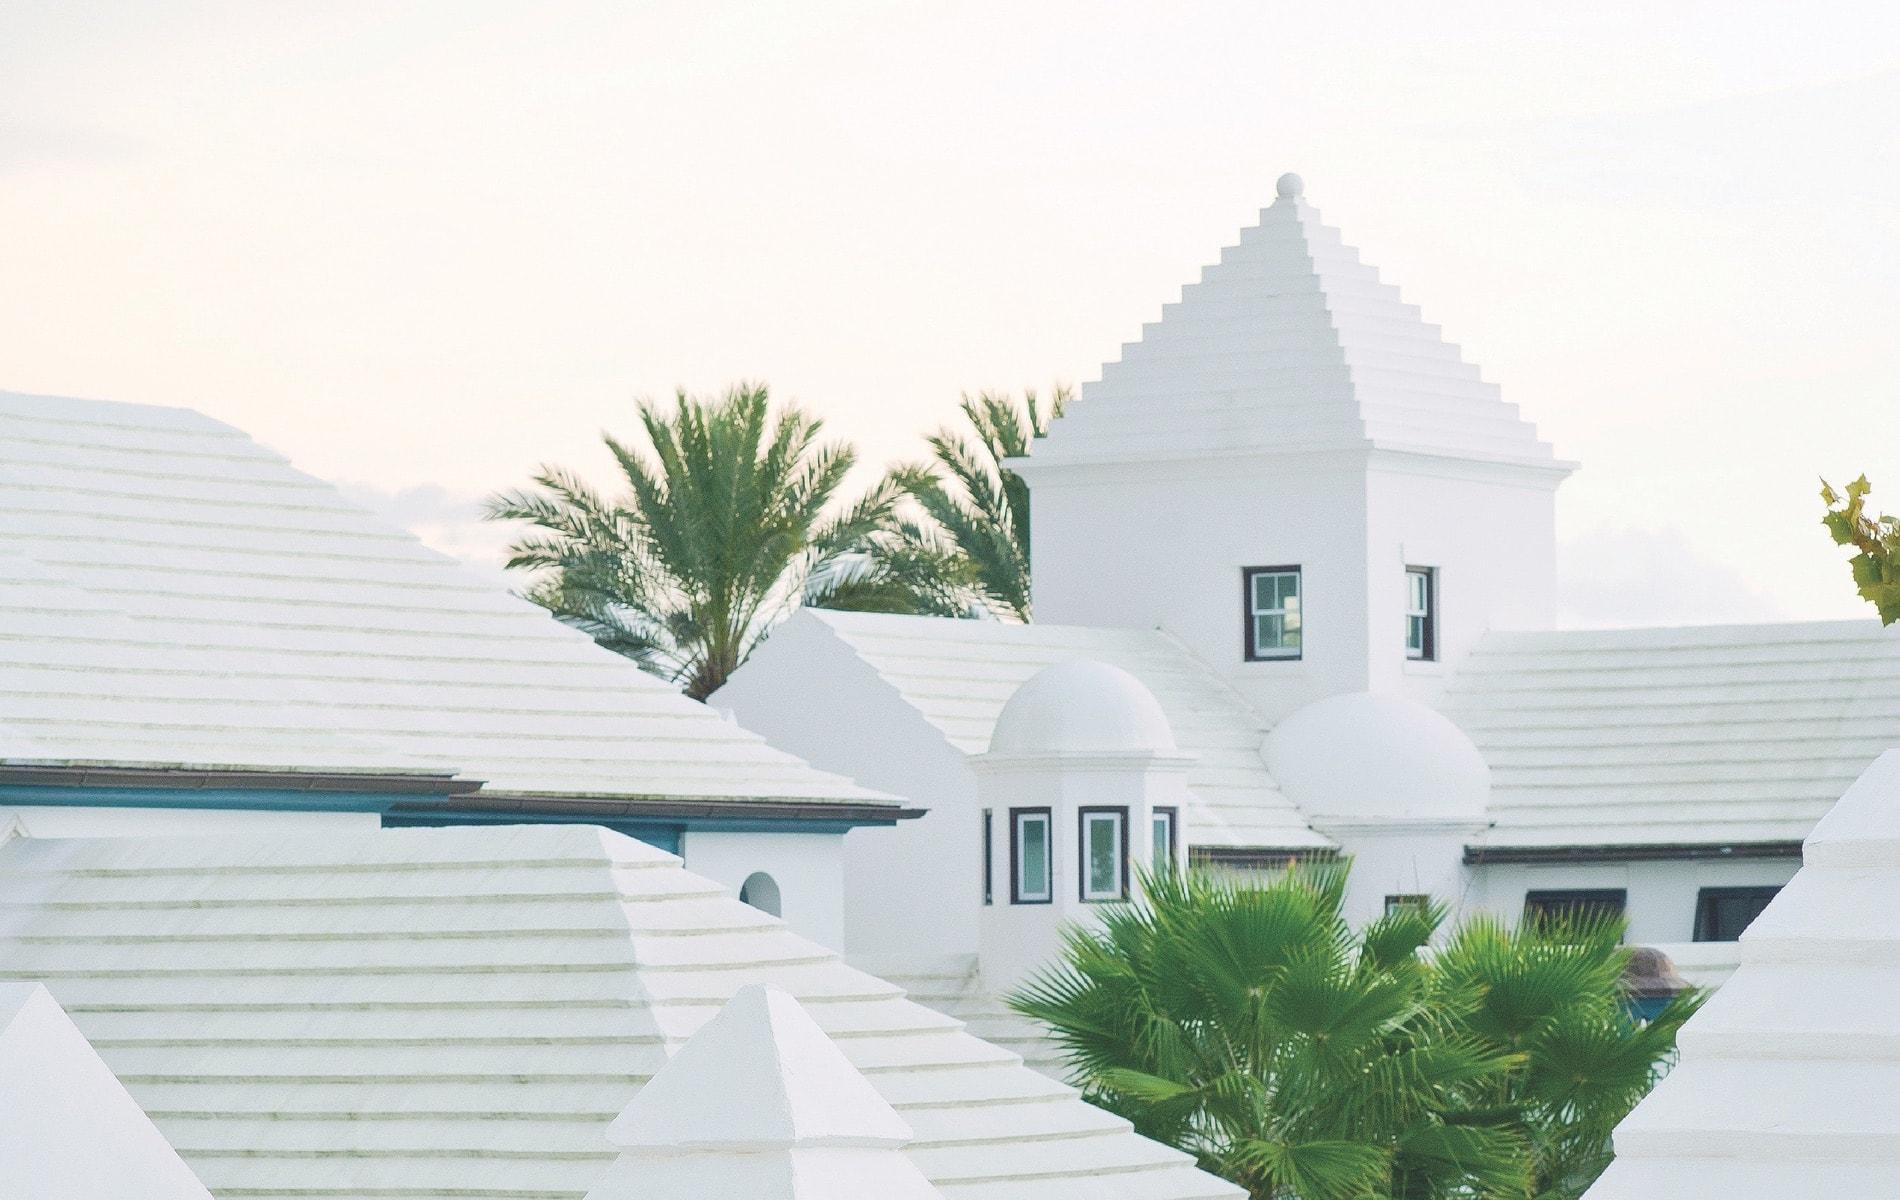 Alys Beach, Alys Beach FL, Alys Beach Florida